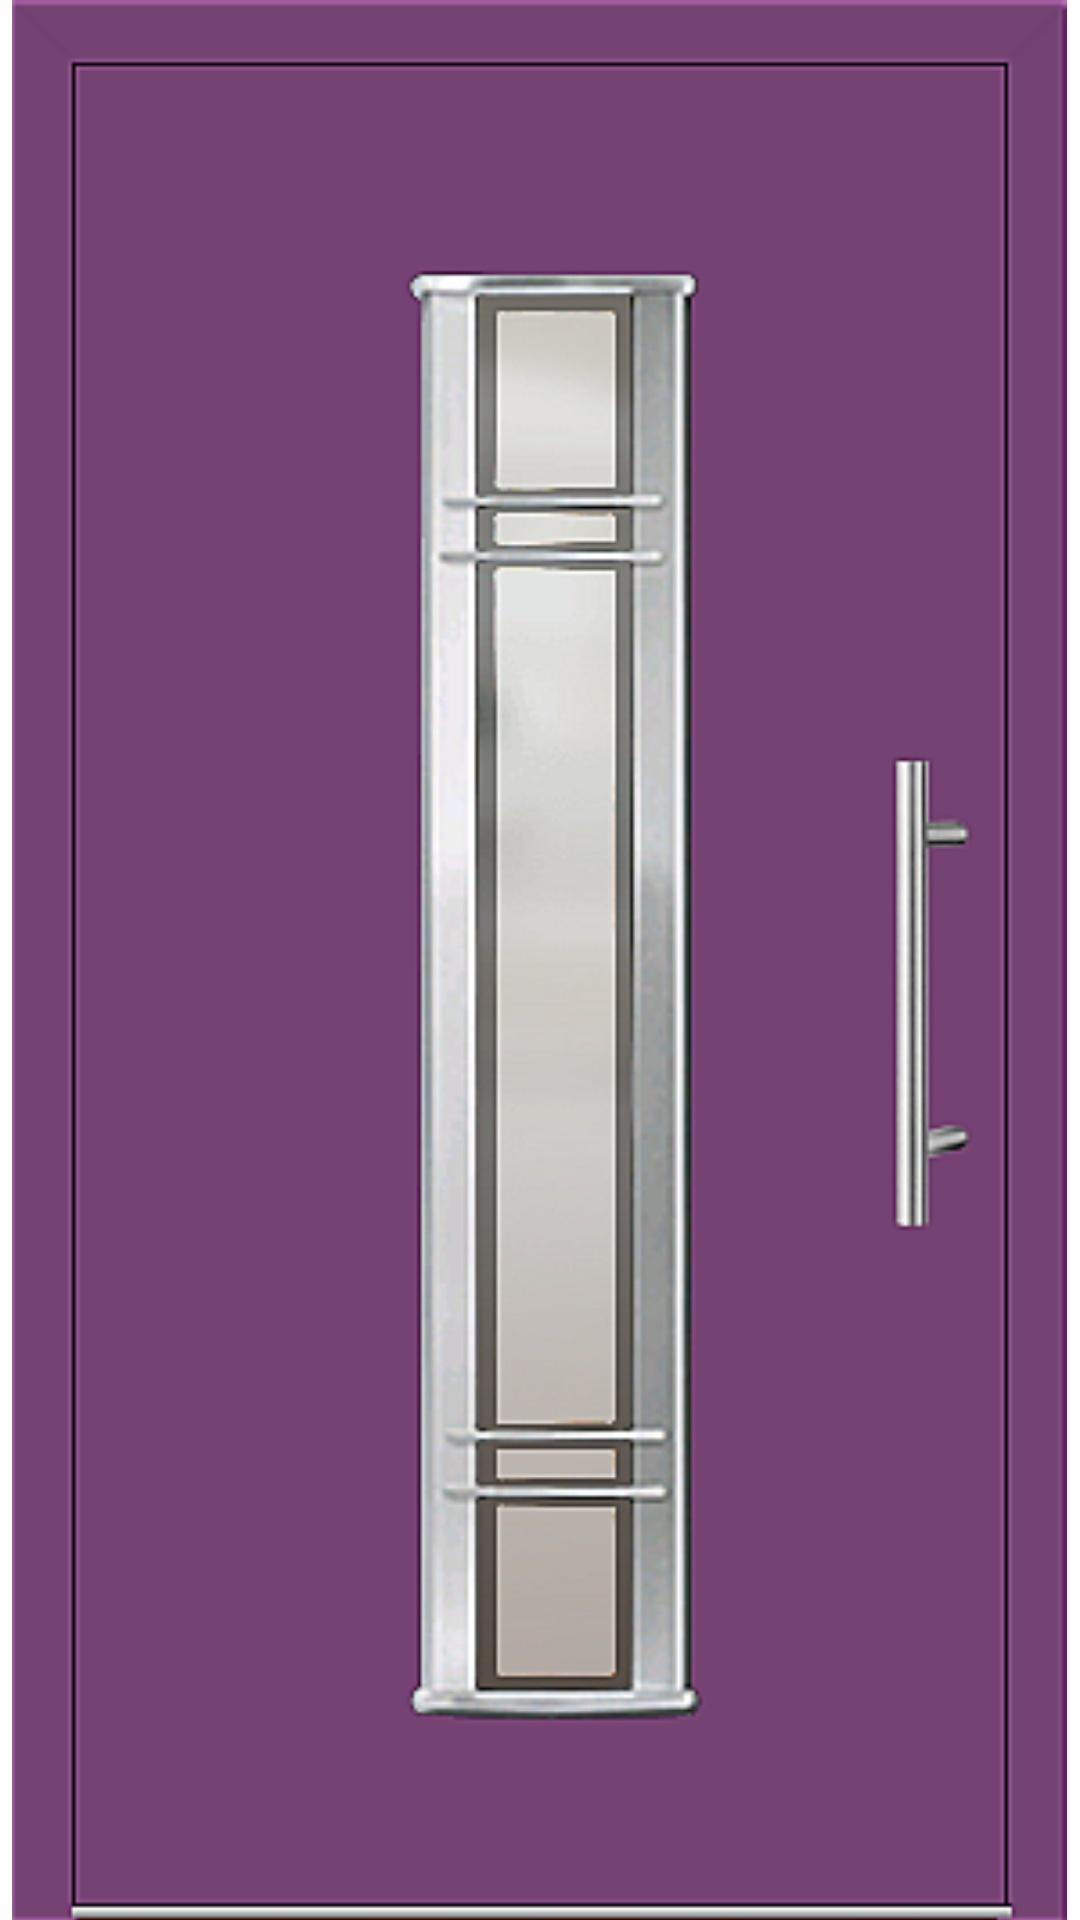 Aluminium Haustür Modell 6962-79 singalviolett